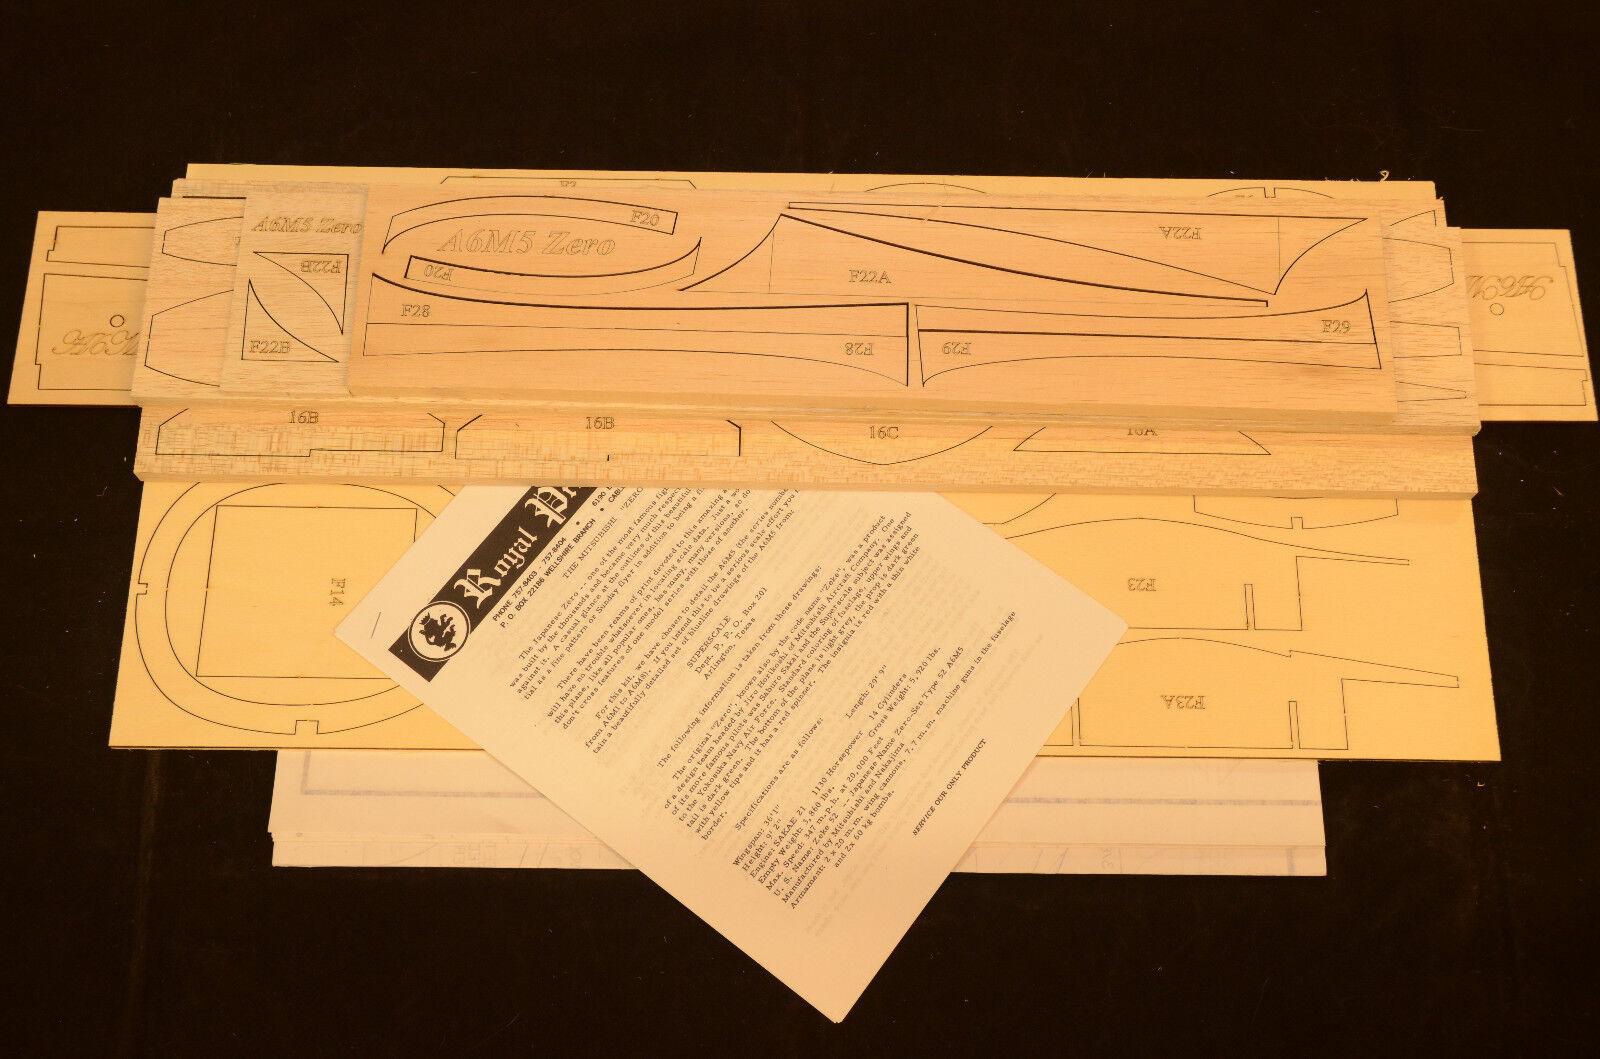 1 8 Escala Real Mitsubishi A6m5 Zero Corte Láser Kit, Planes & Instr. 62.5  Ws